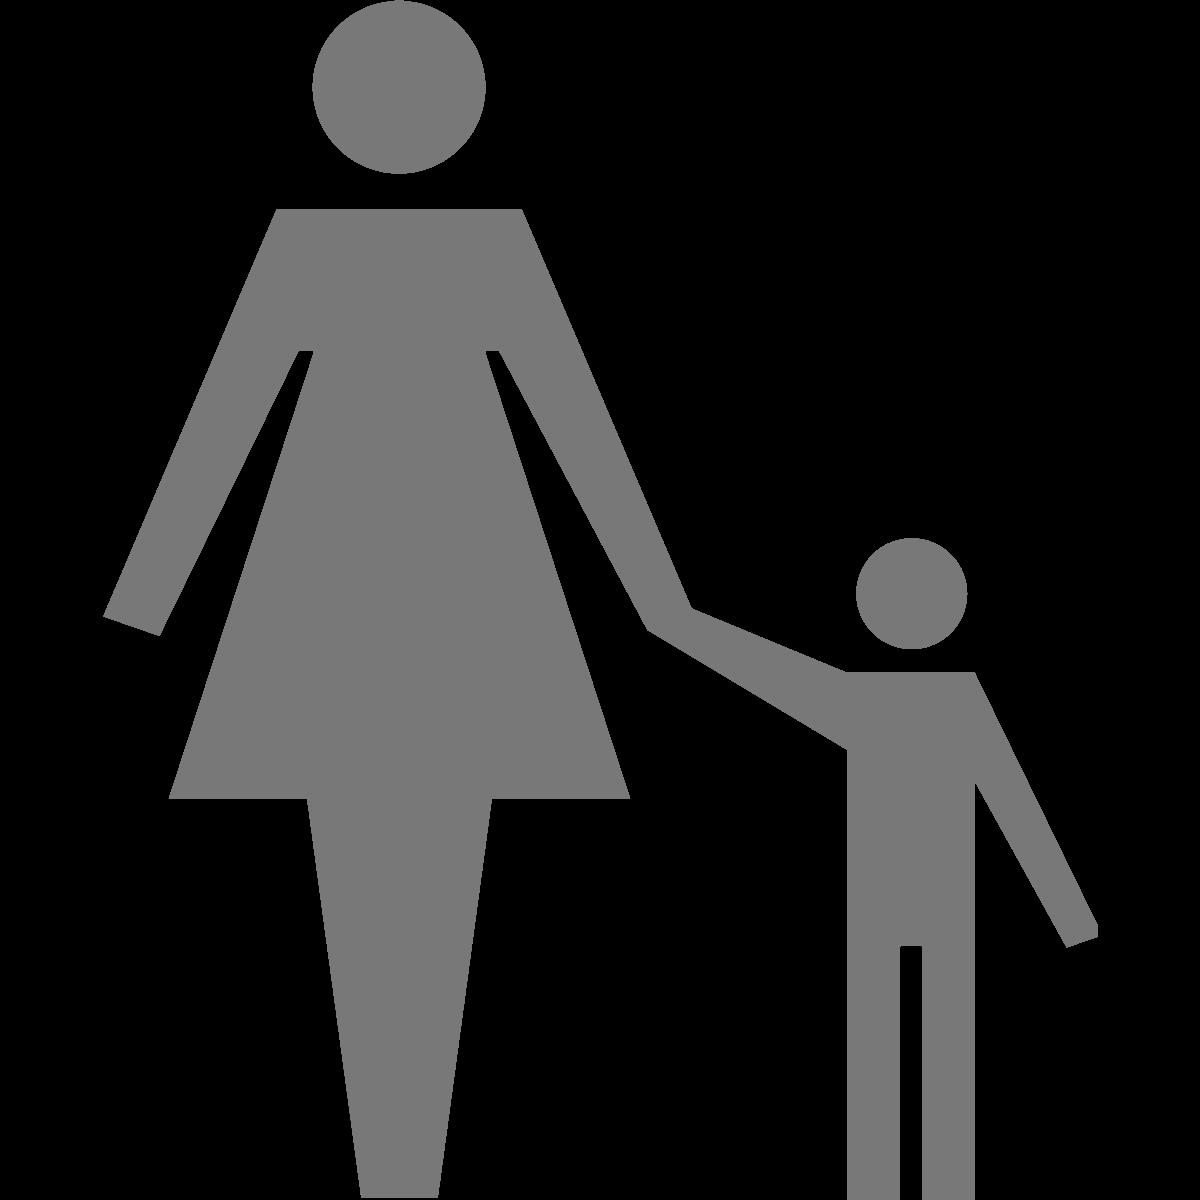 Bathroom public toilet woman. Fighting clipart crime violence